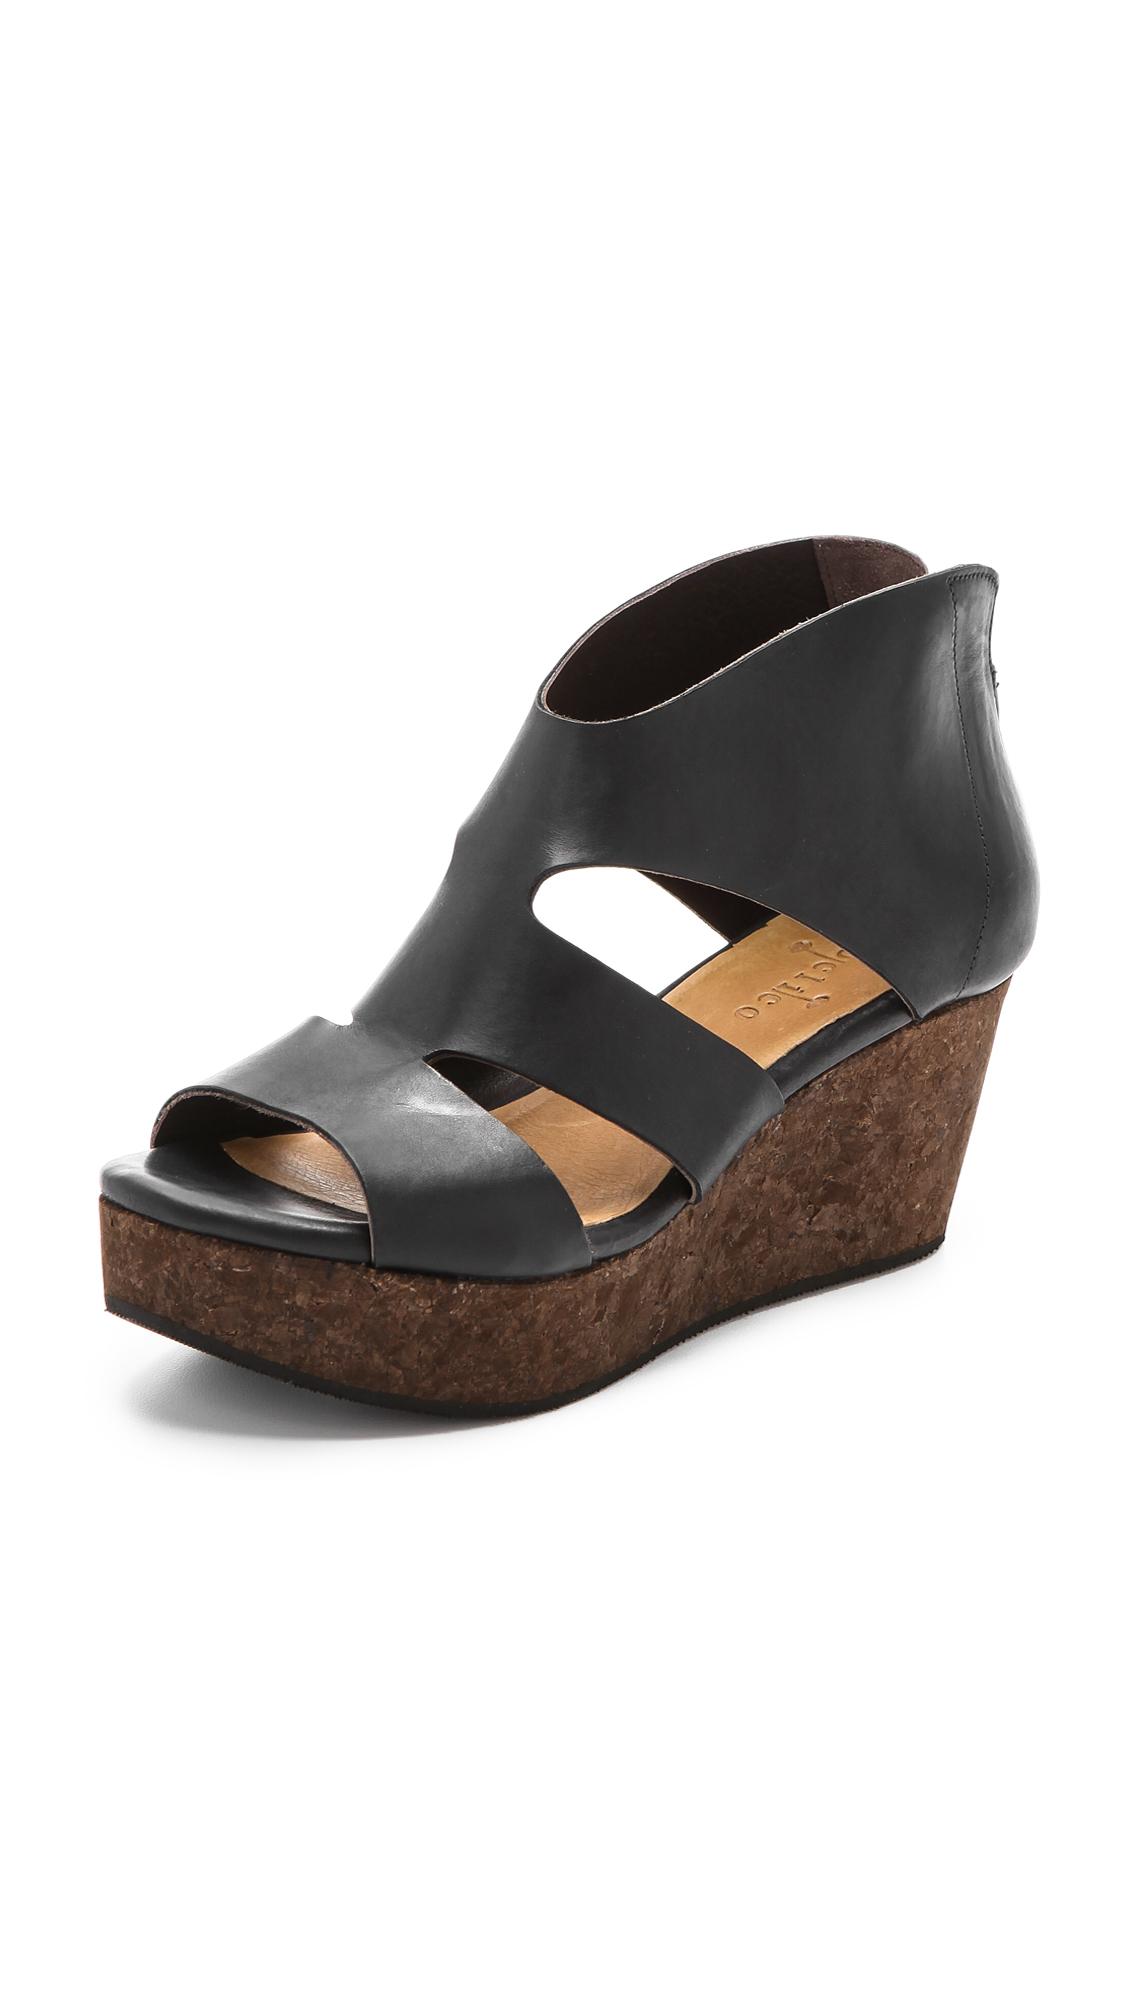 Coclico Shoes Review